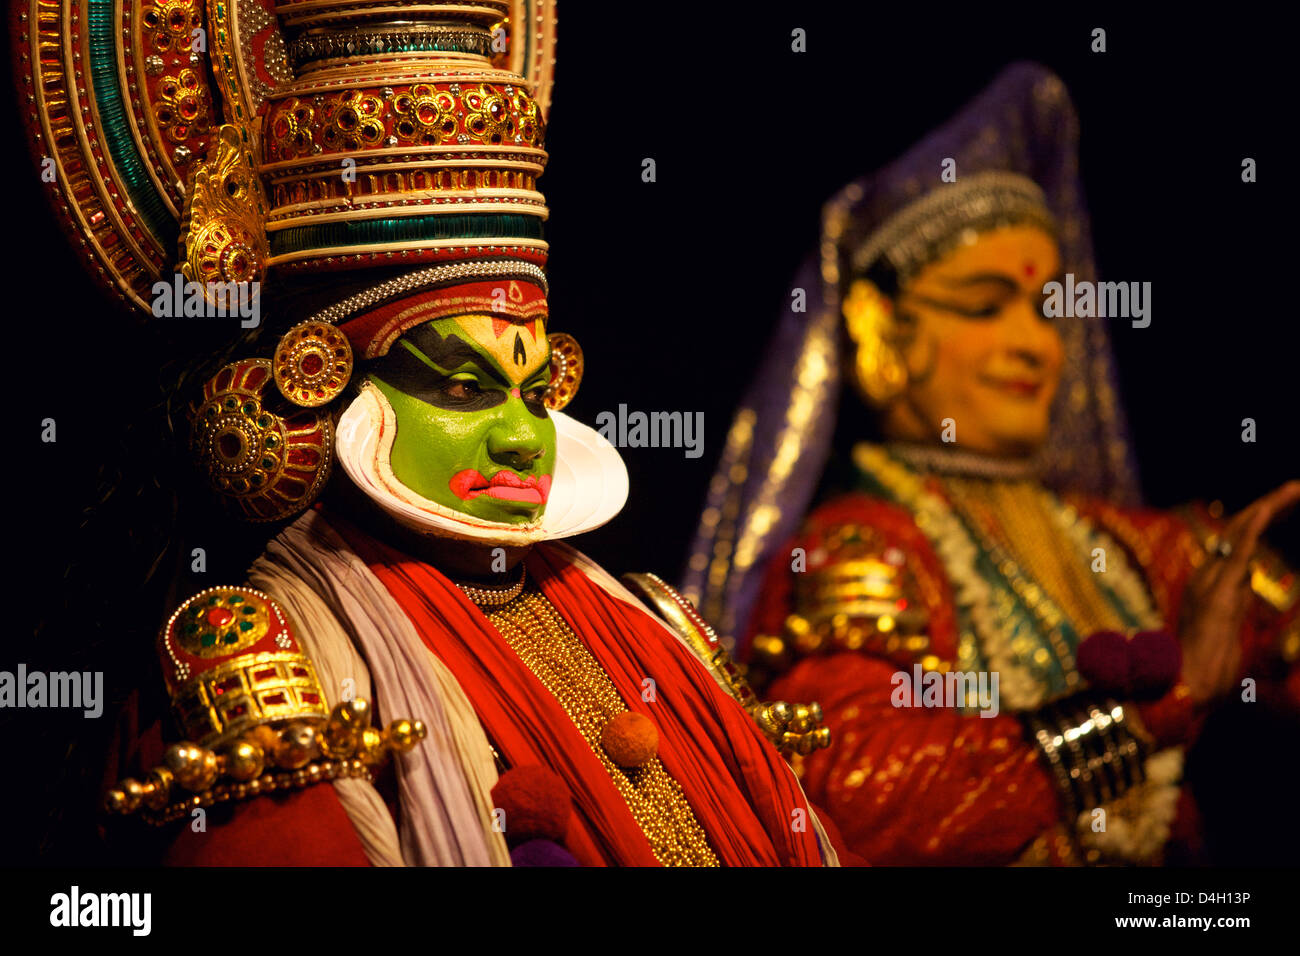 Spectacle of Kutiyattam, Indian theater in Kochi, Kerala, India - Stock Image